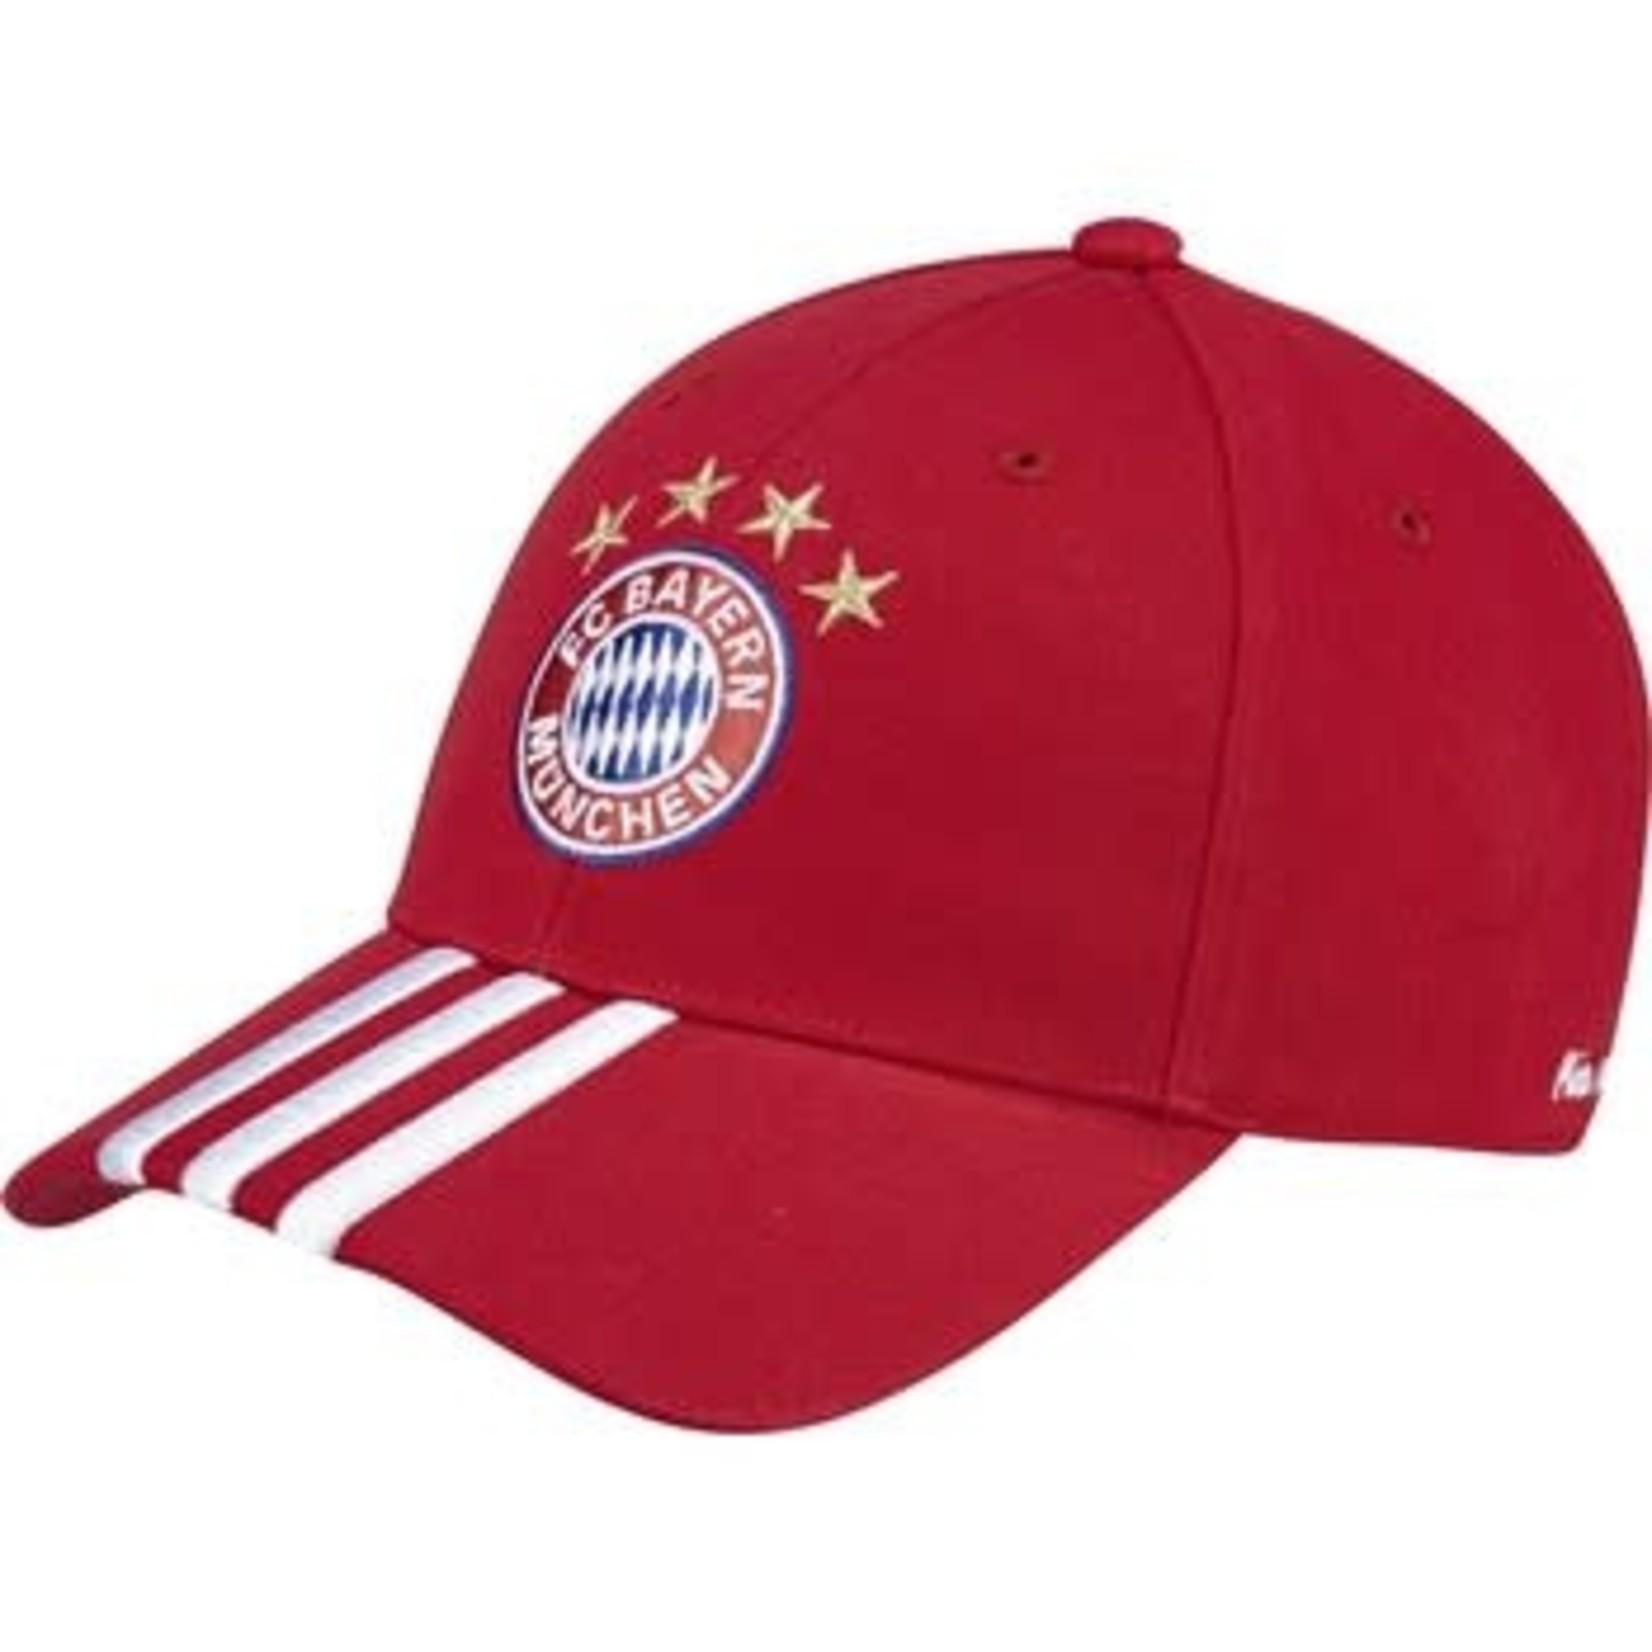 ADIDAS BAYERN MUNICH 3S CAP